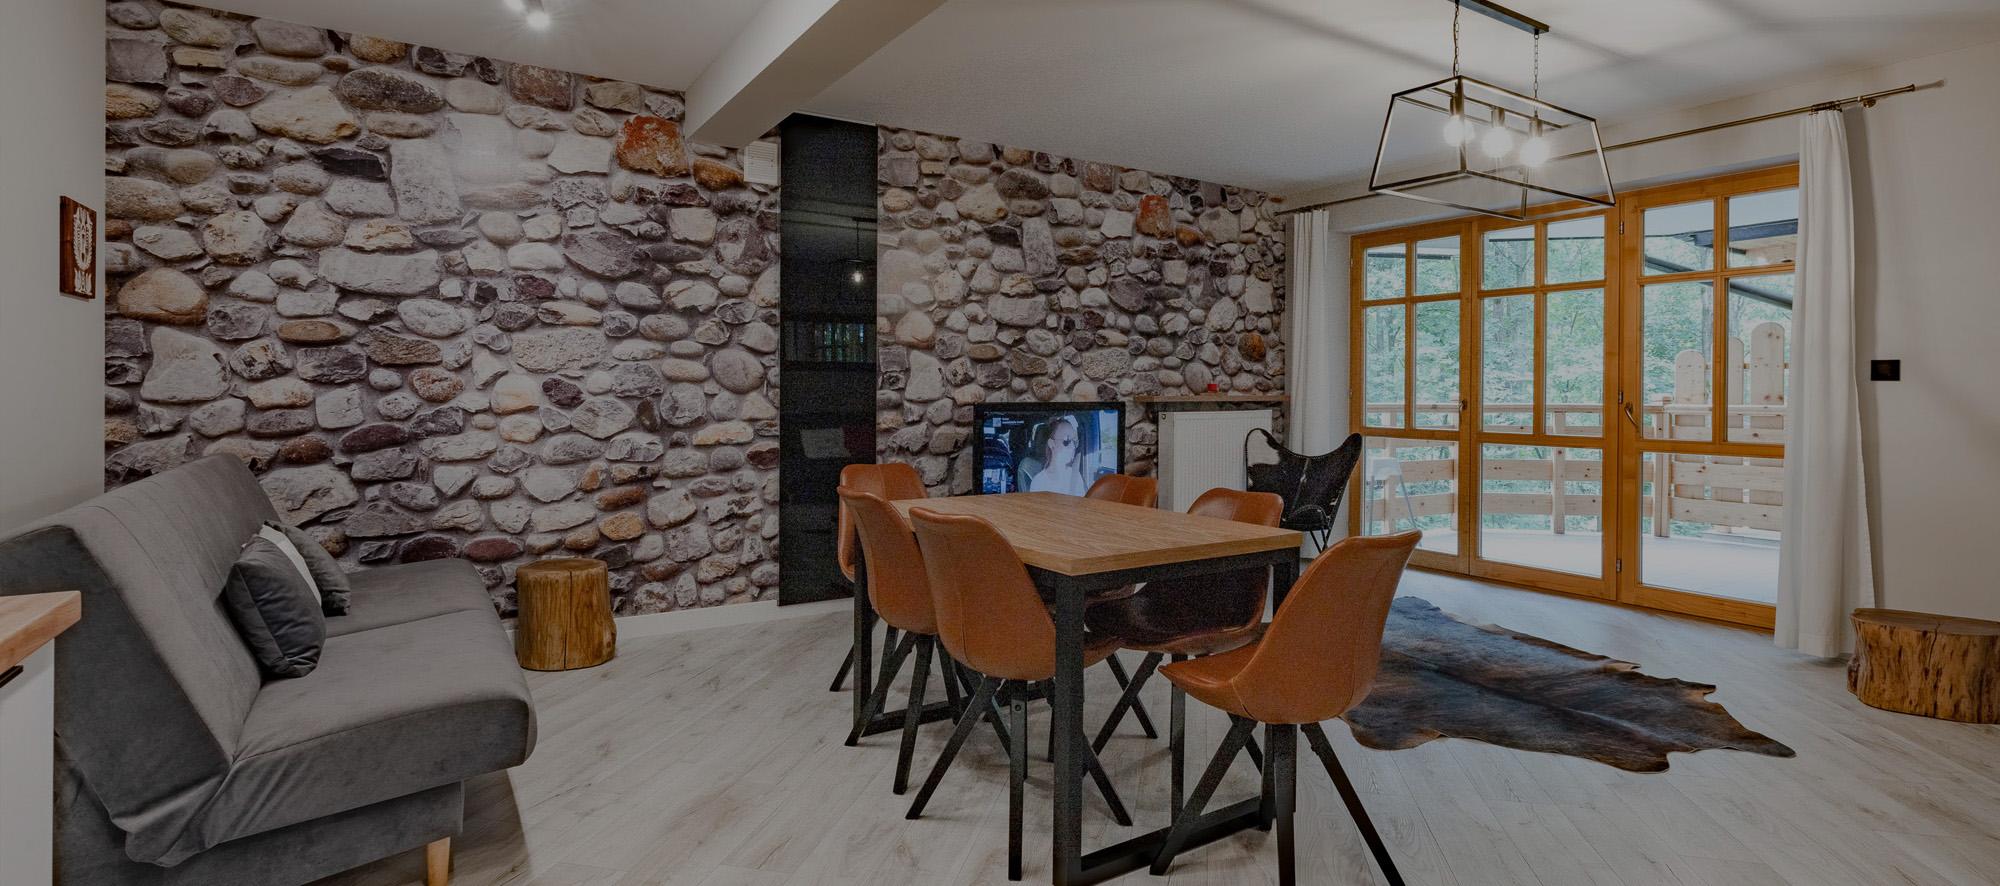 A modern apartment in Zakopane